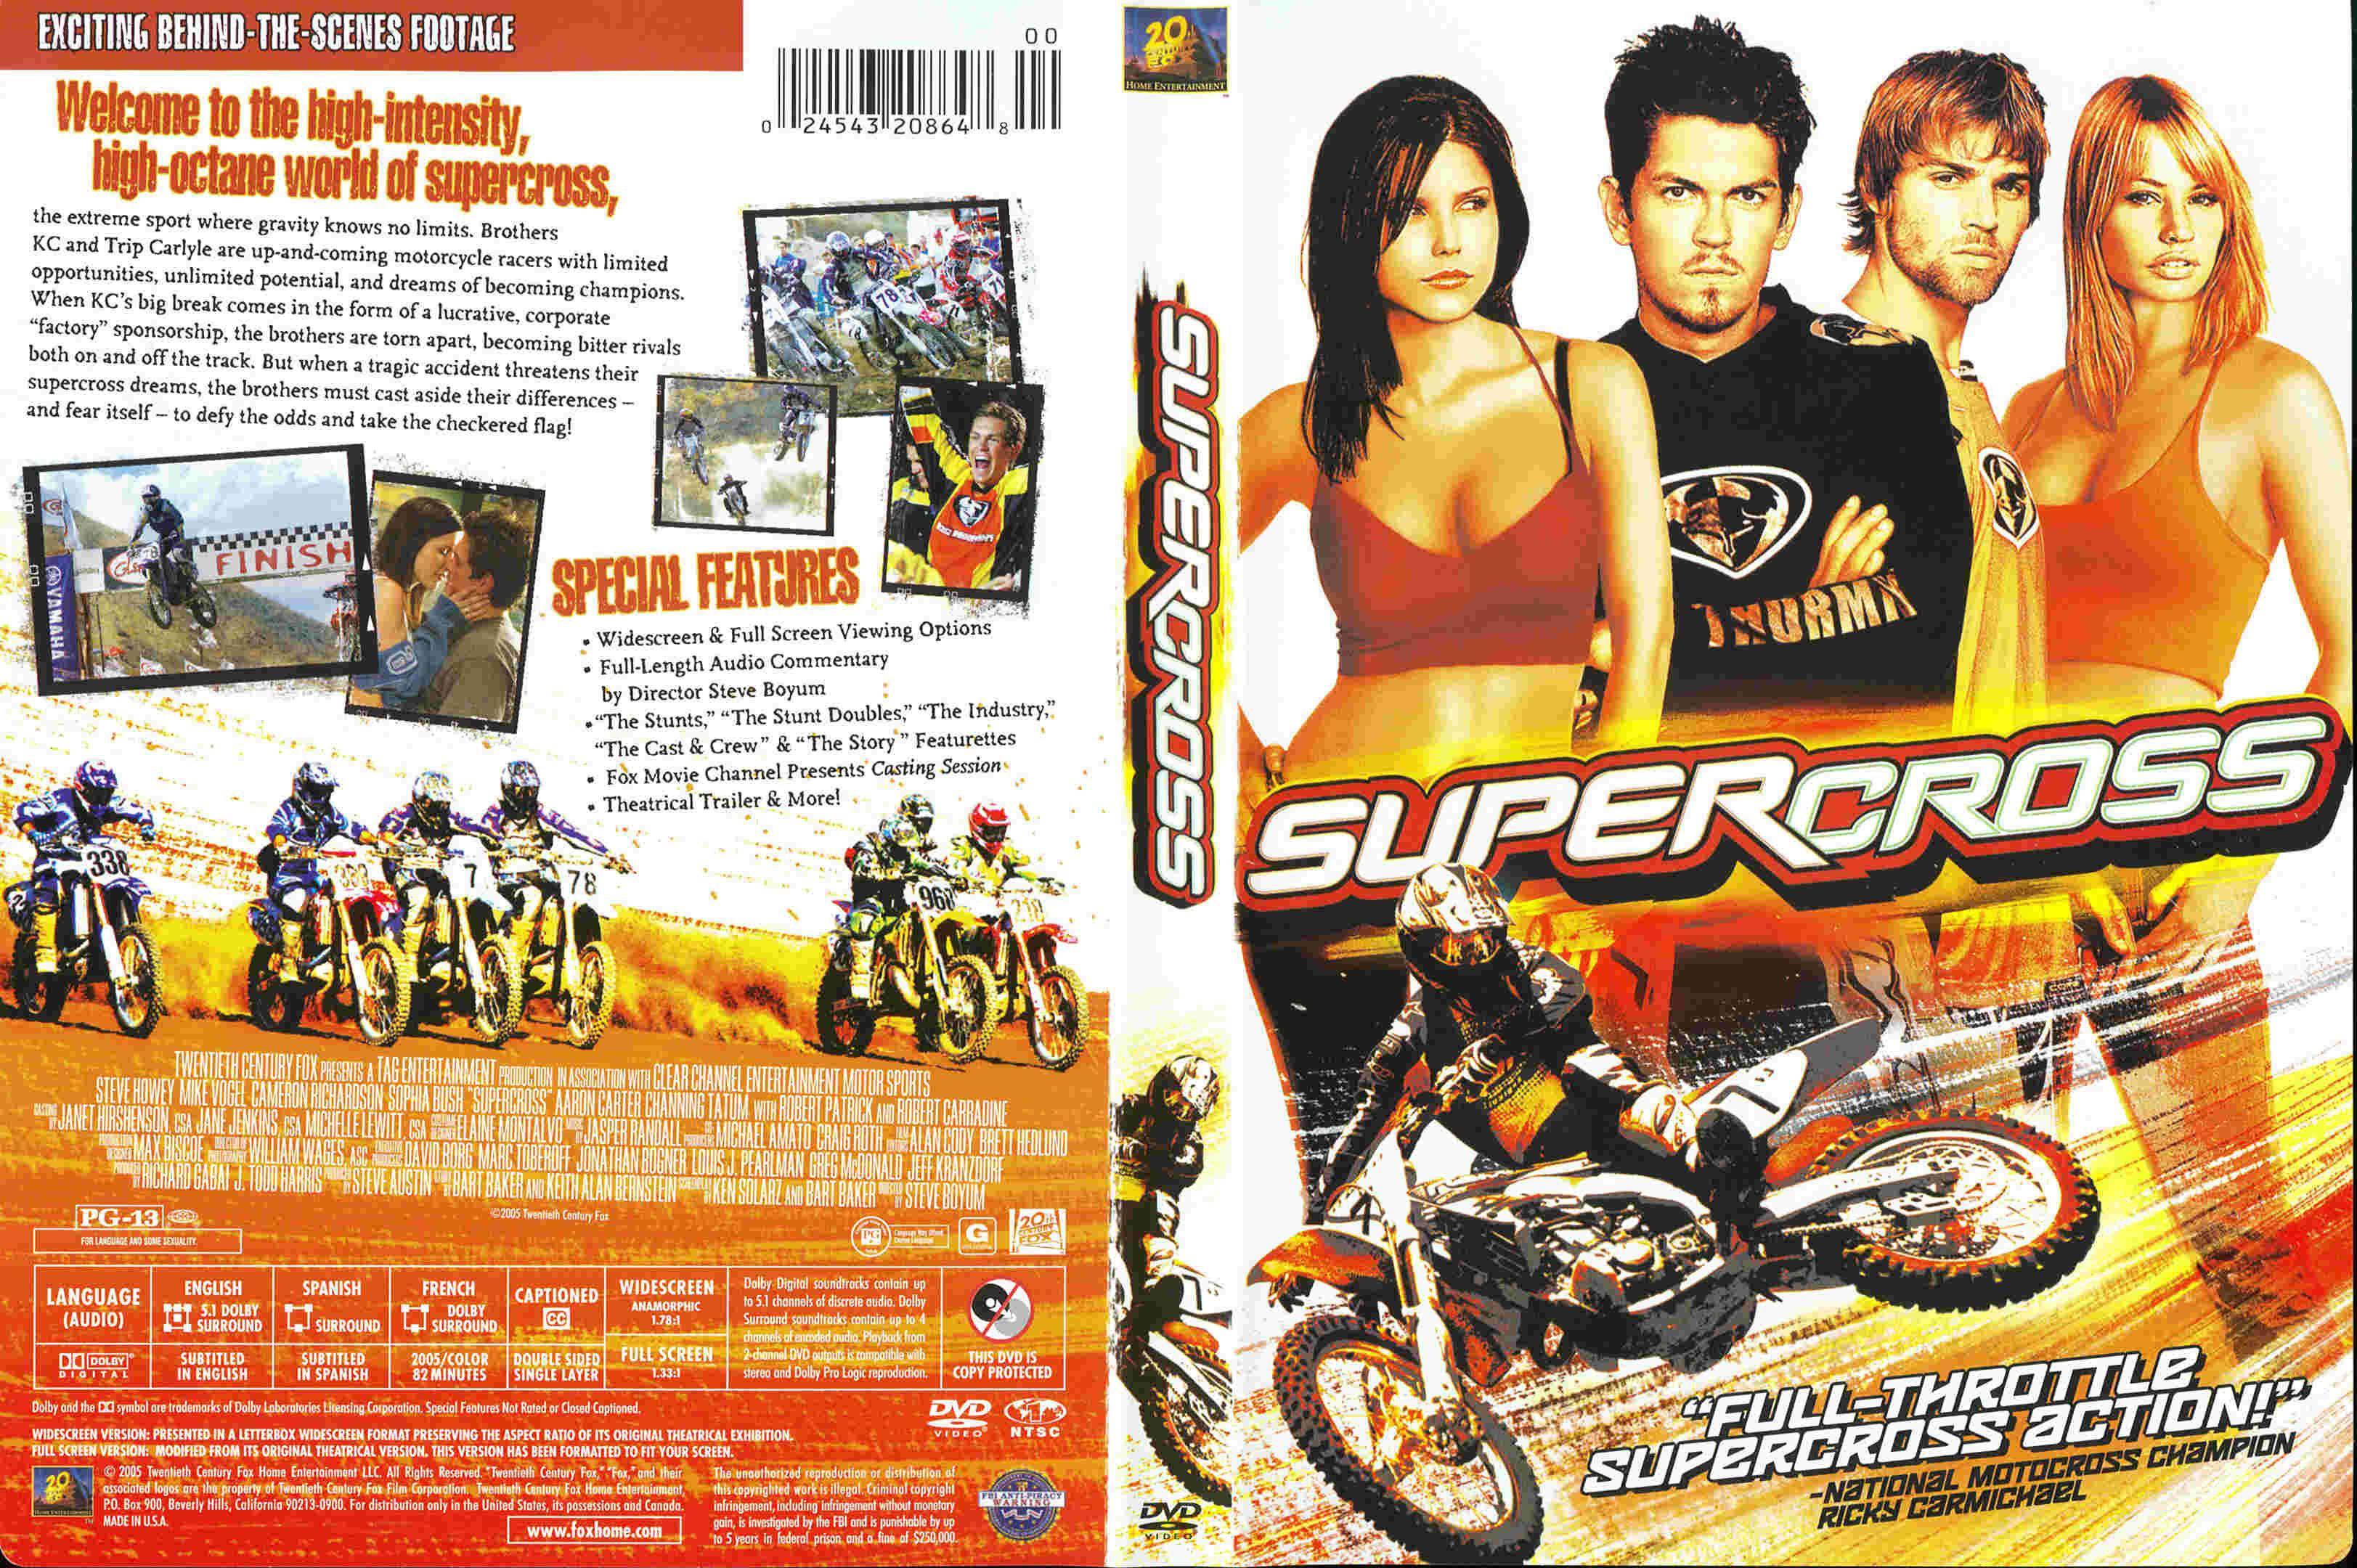 supercross (2005) - front back